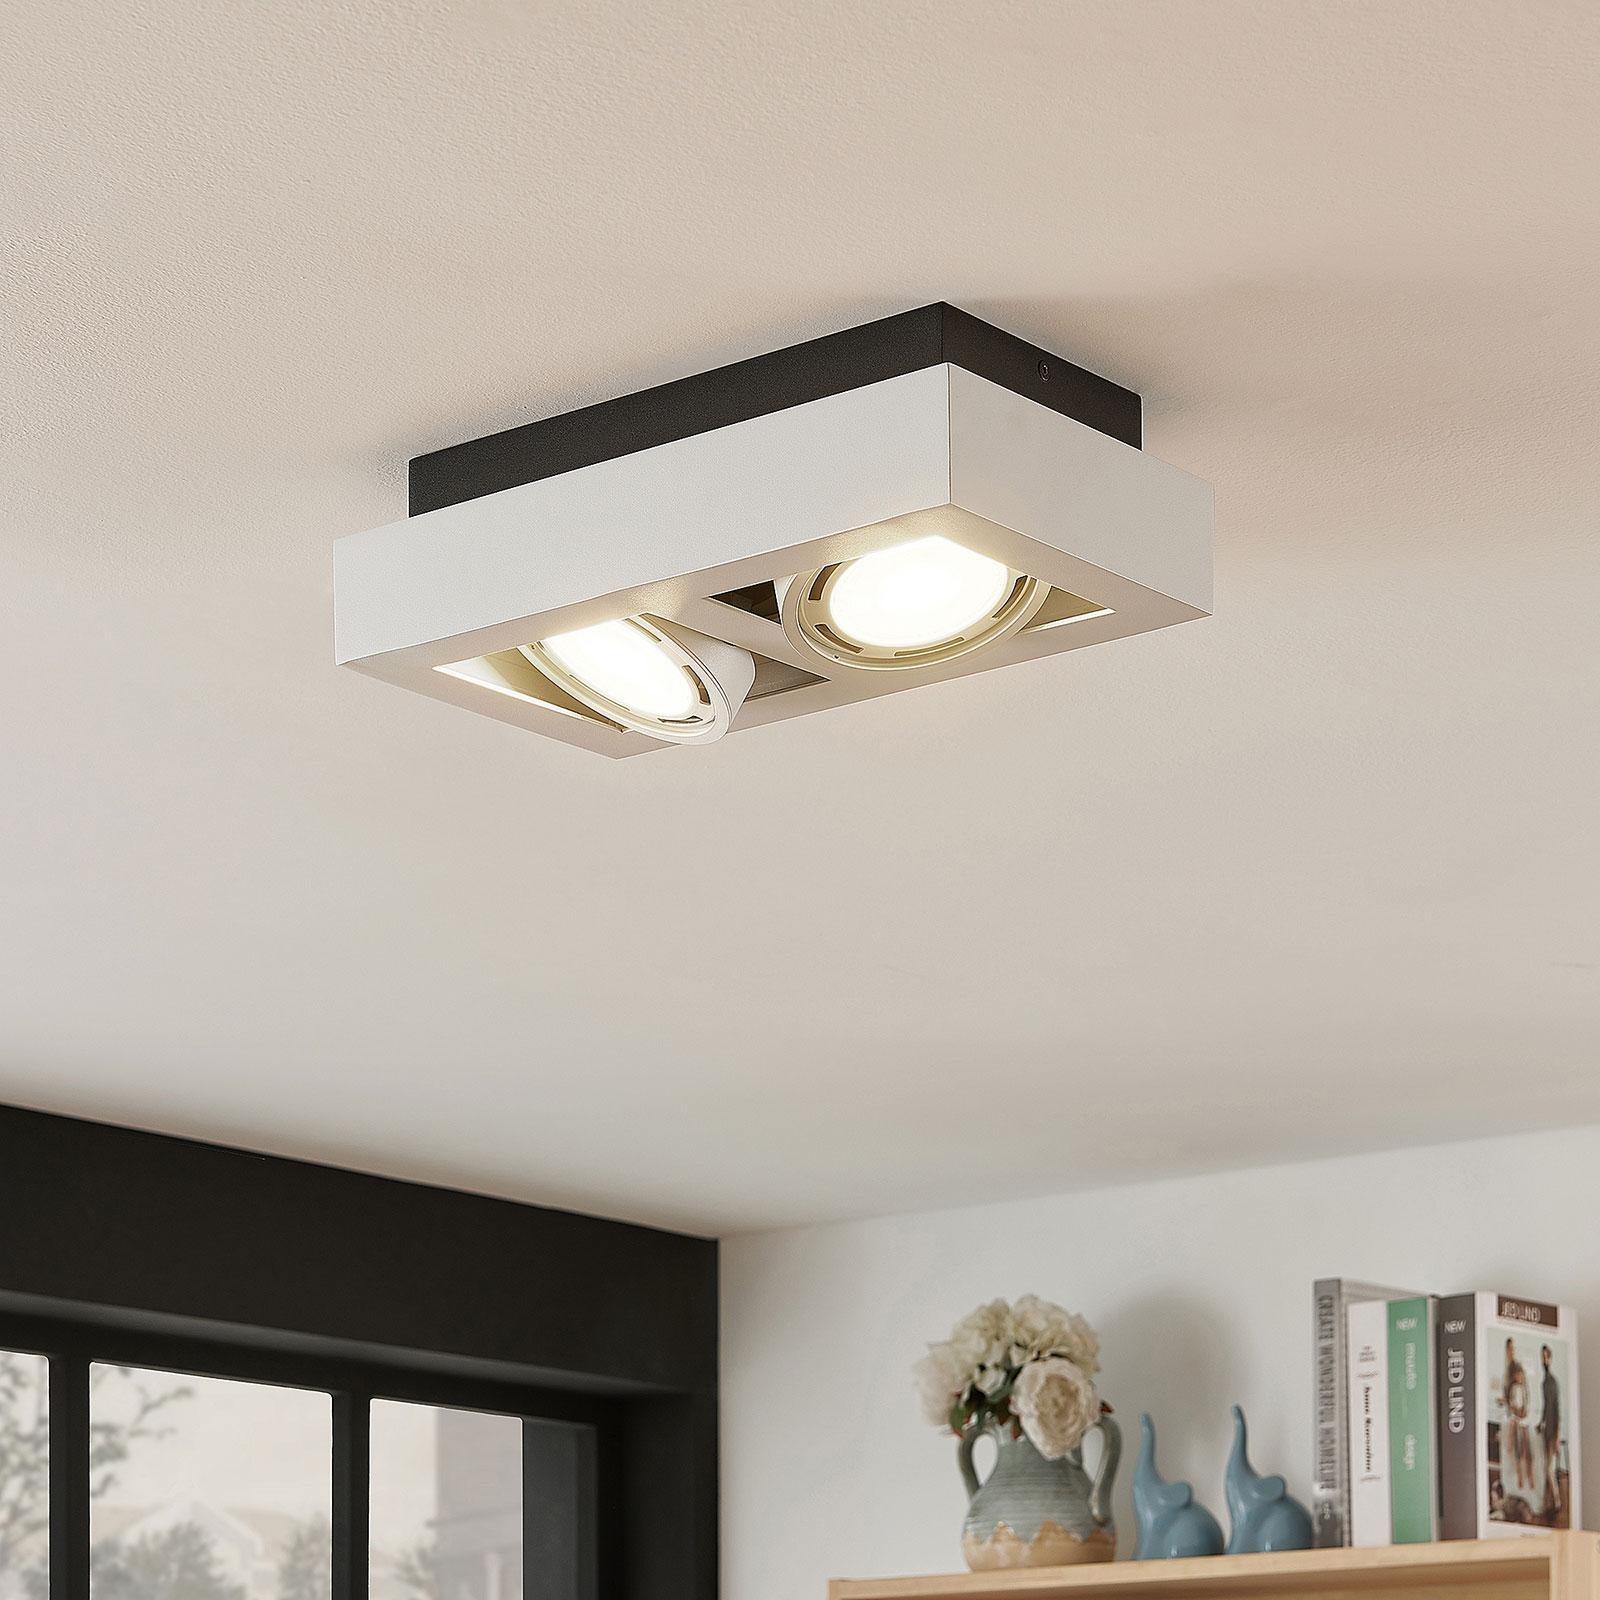 Spot pour plafond LED Ronka, 2 lampes, blanc